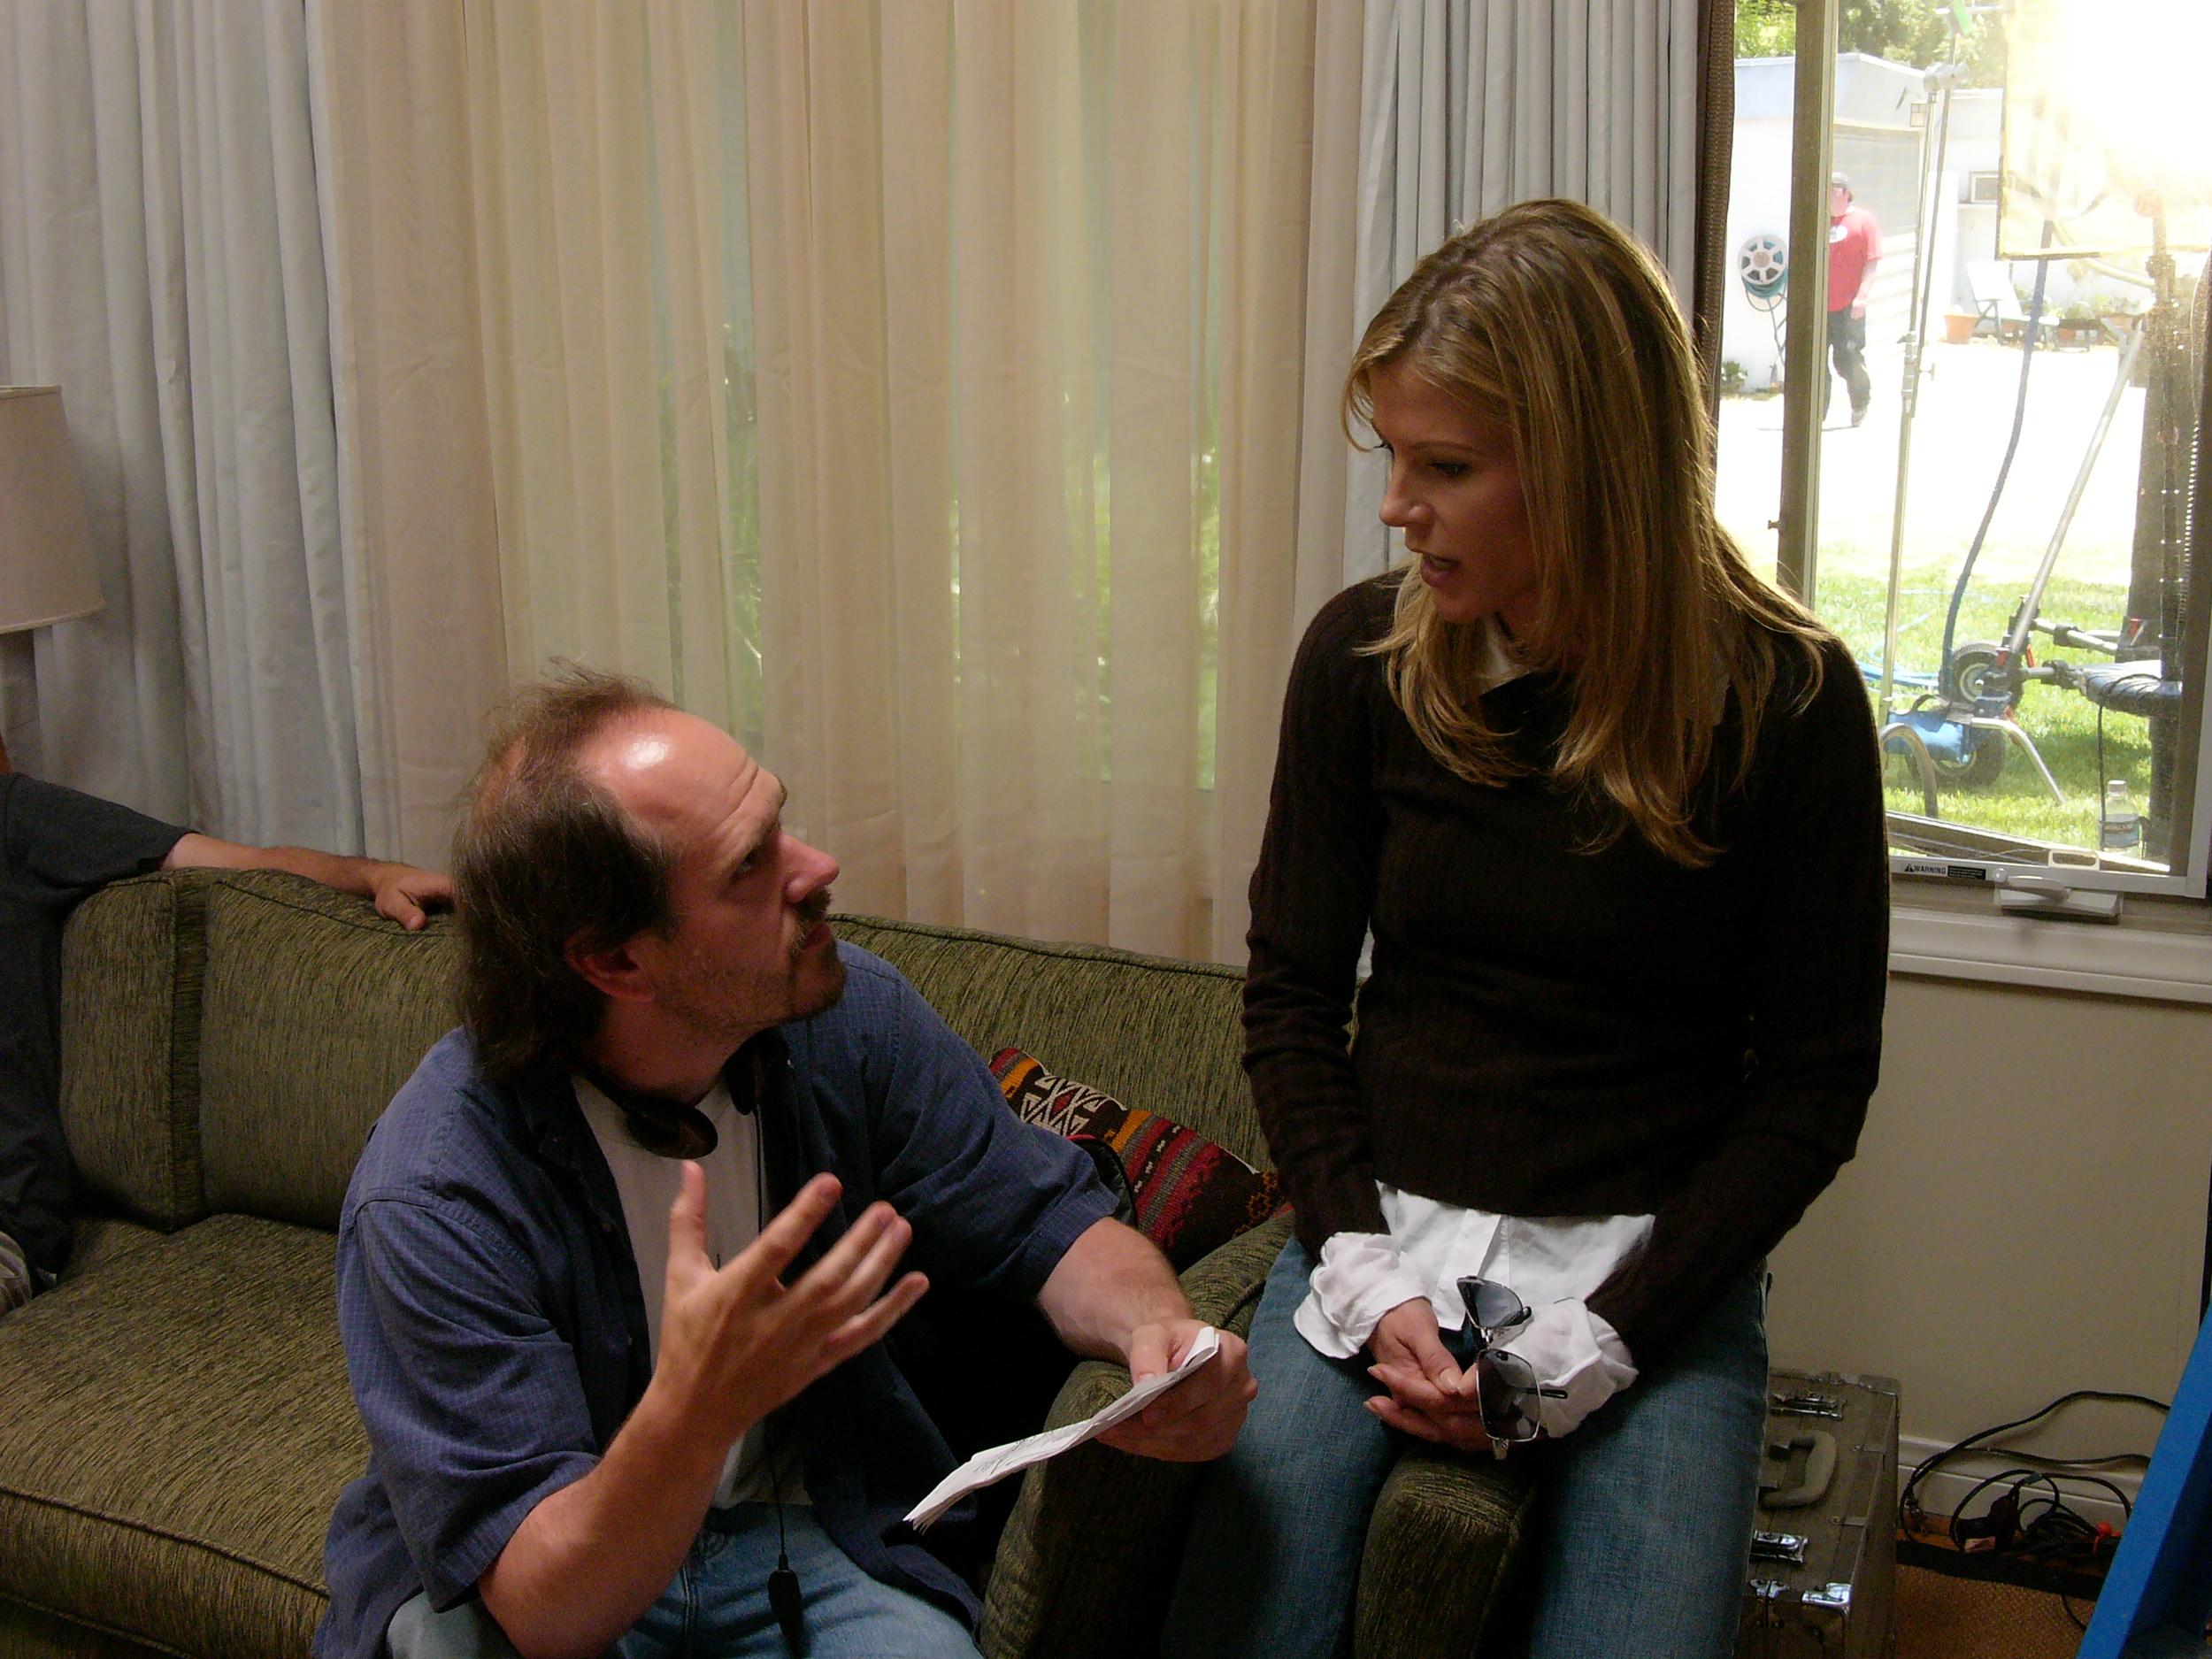 With Julie Bowen on Kids in America